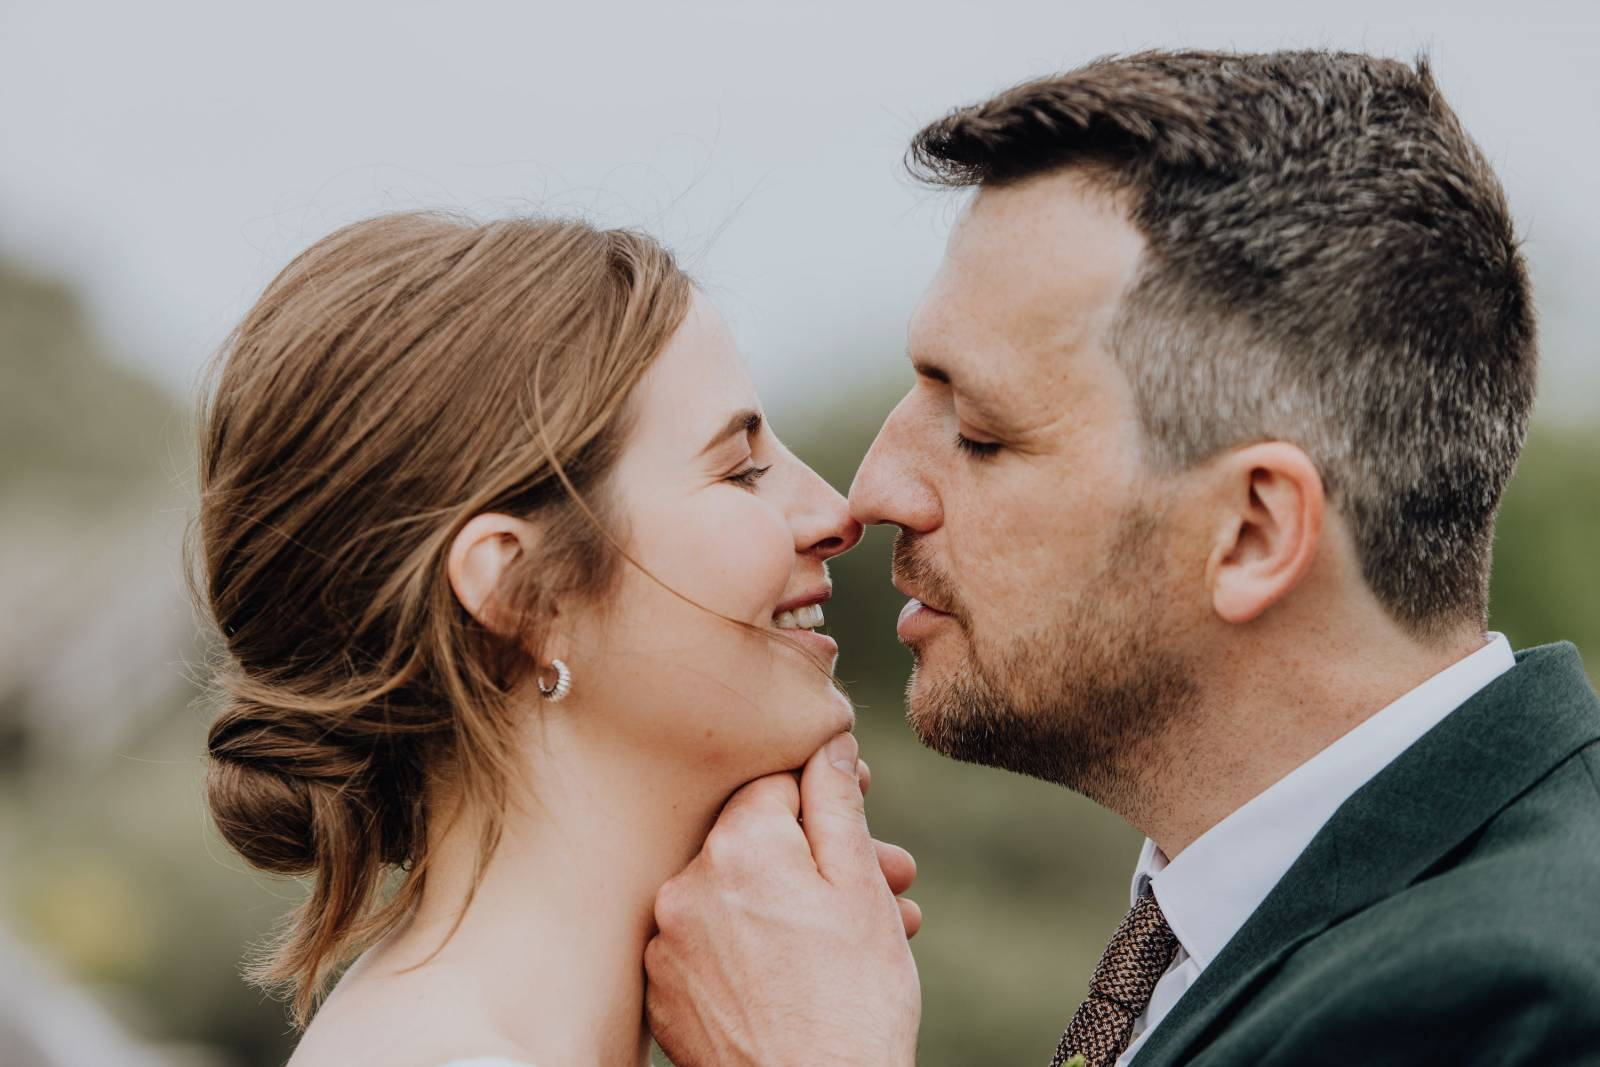 Alissia Porez - 5D4_0627 - Elise Buyse - Fotograaf Luxvisuals - House of Weddings